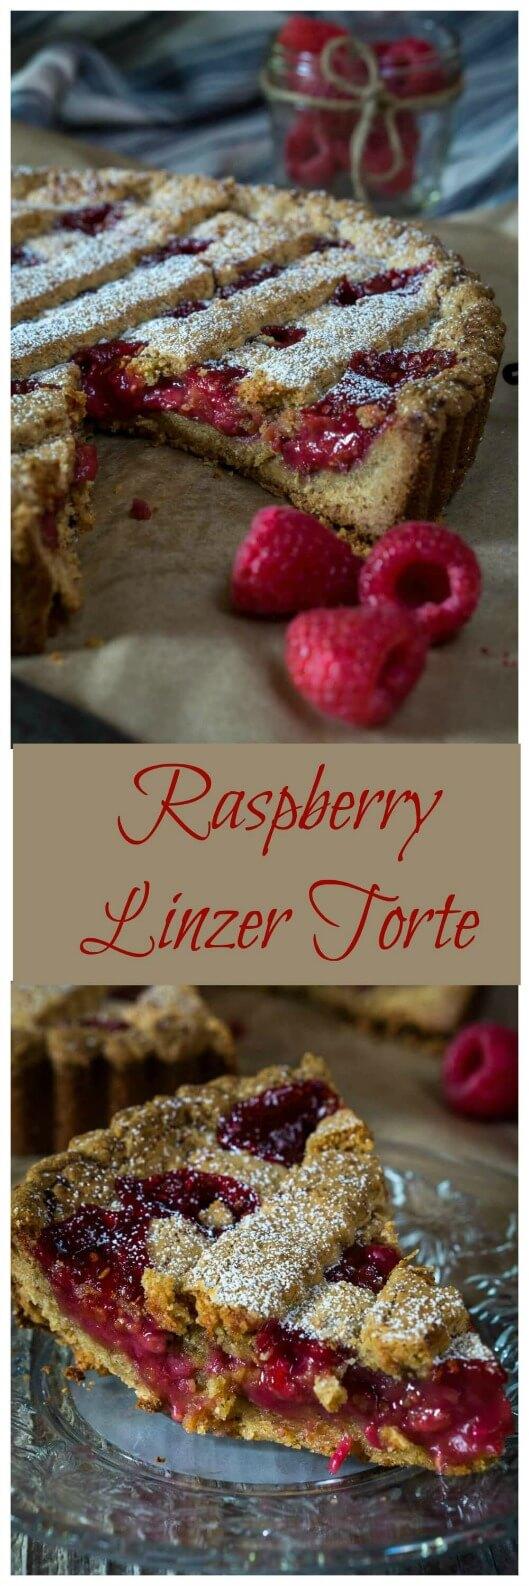 Raspberry Linzer Torte has an almond shell that tastes like a warm cookie filled with a thick luscious fresh raspberry filling. #Linzertorte #raspberry #dessert #hostessatheart|